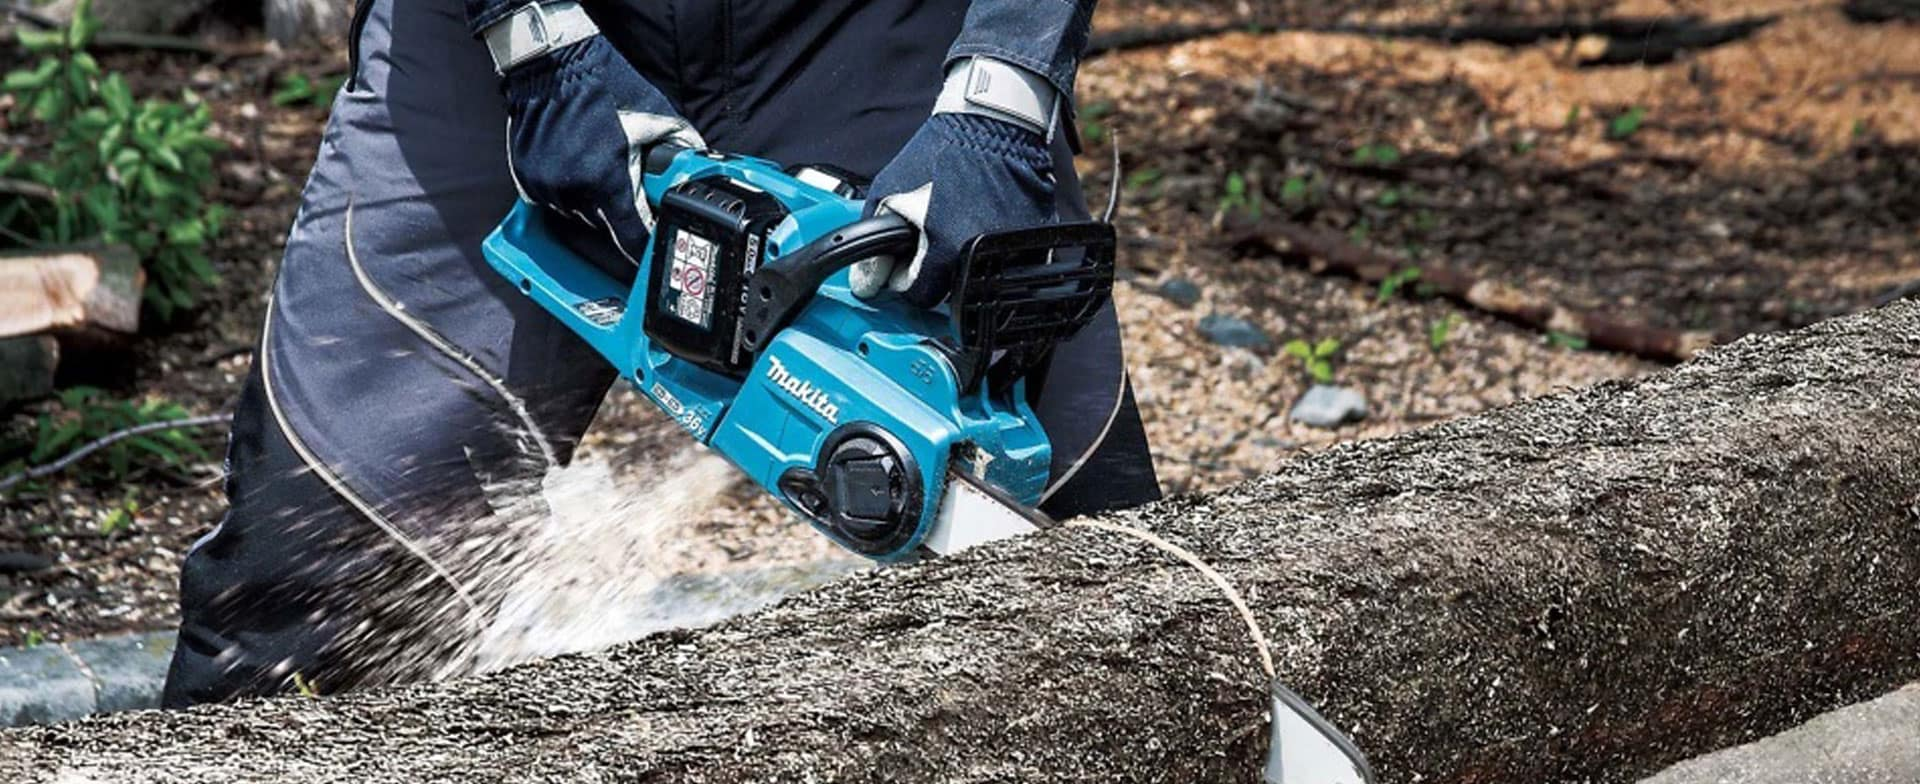 outdoor-power-tool-service-repairs-florida.jpg